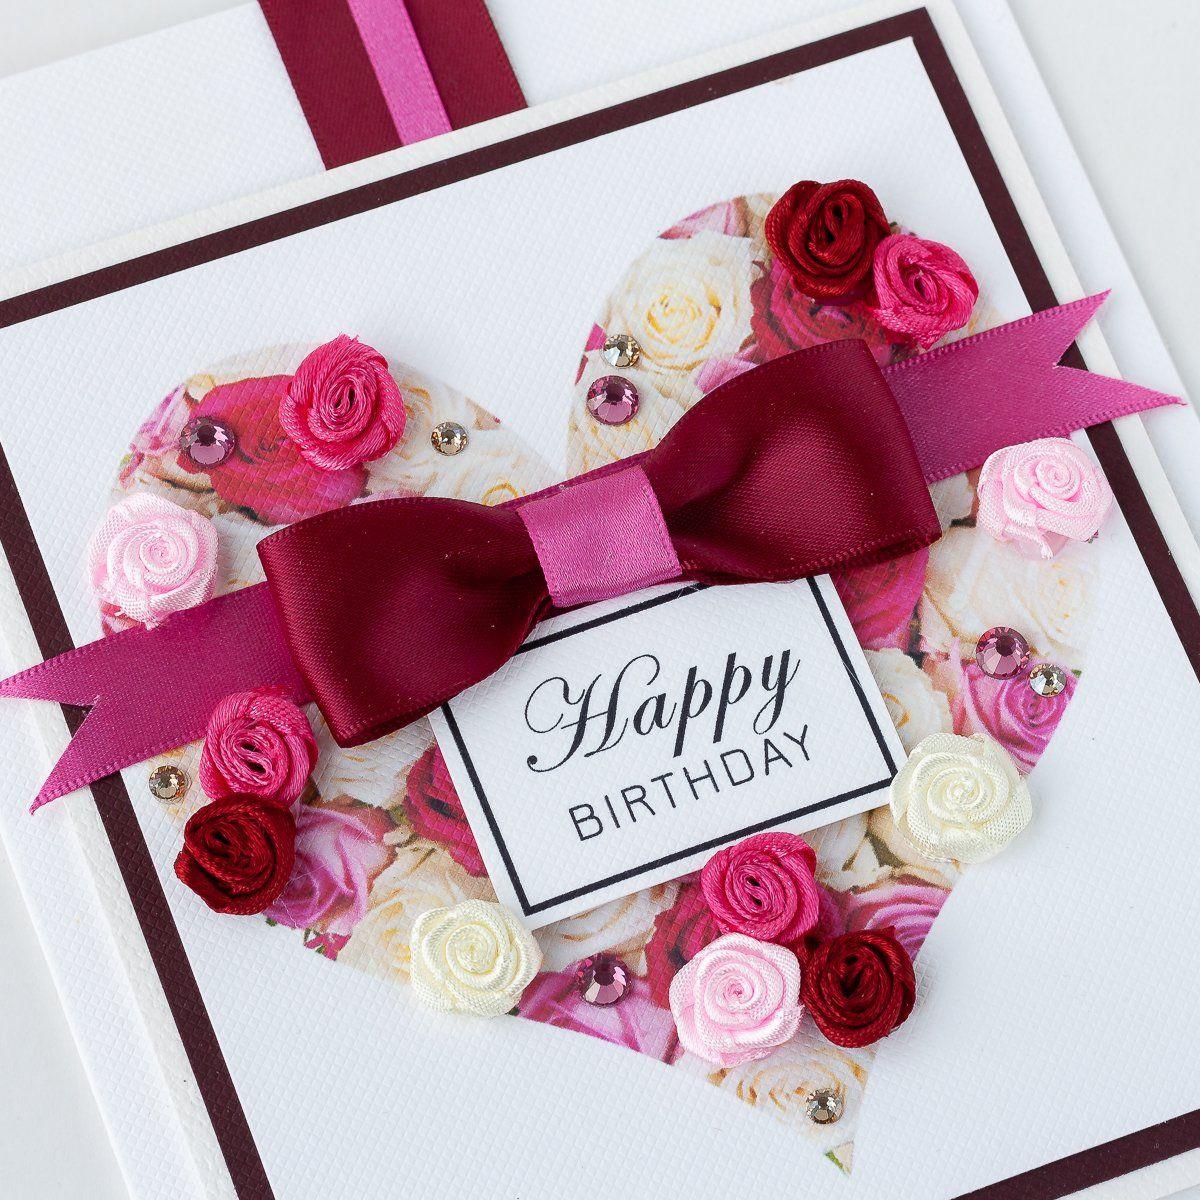 Luxury Boxed Birthday Card Sweetheart Handmade Birthday Cards Luxury Birthday Cards Boxed Birthday Cards